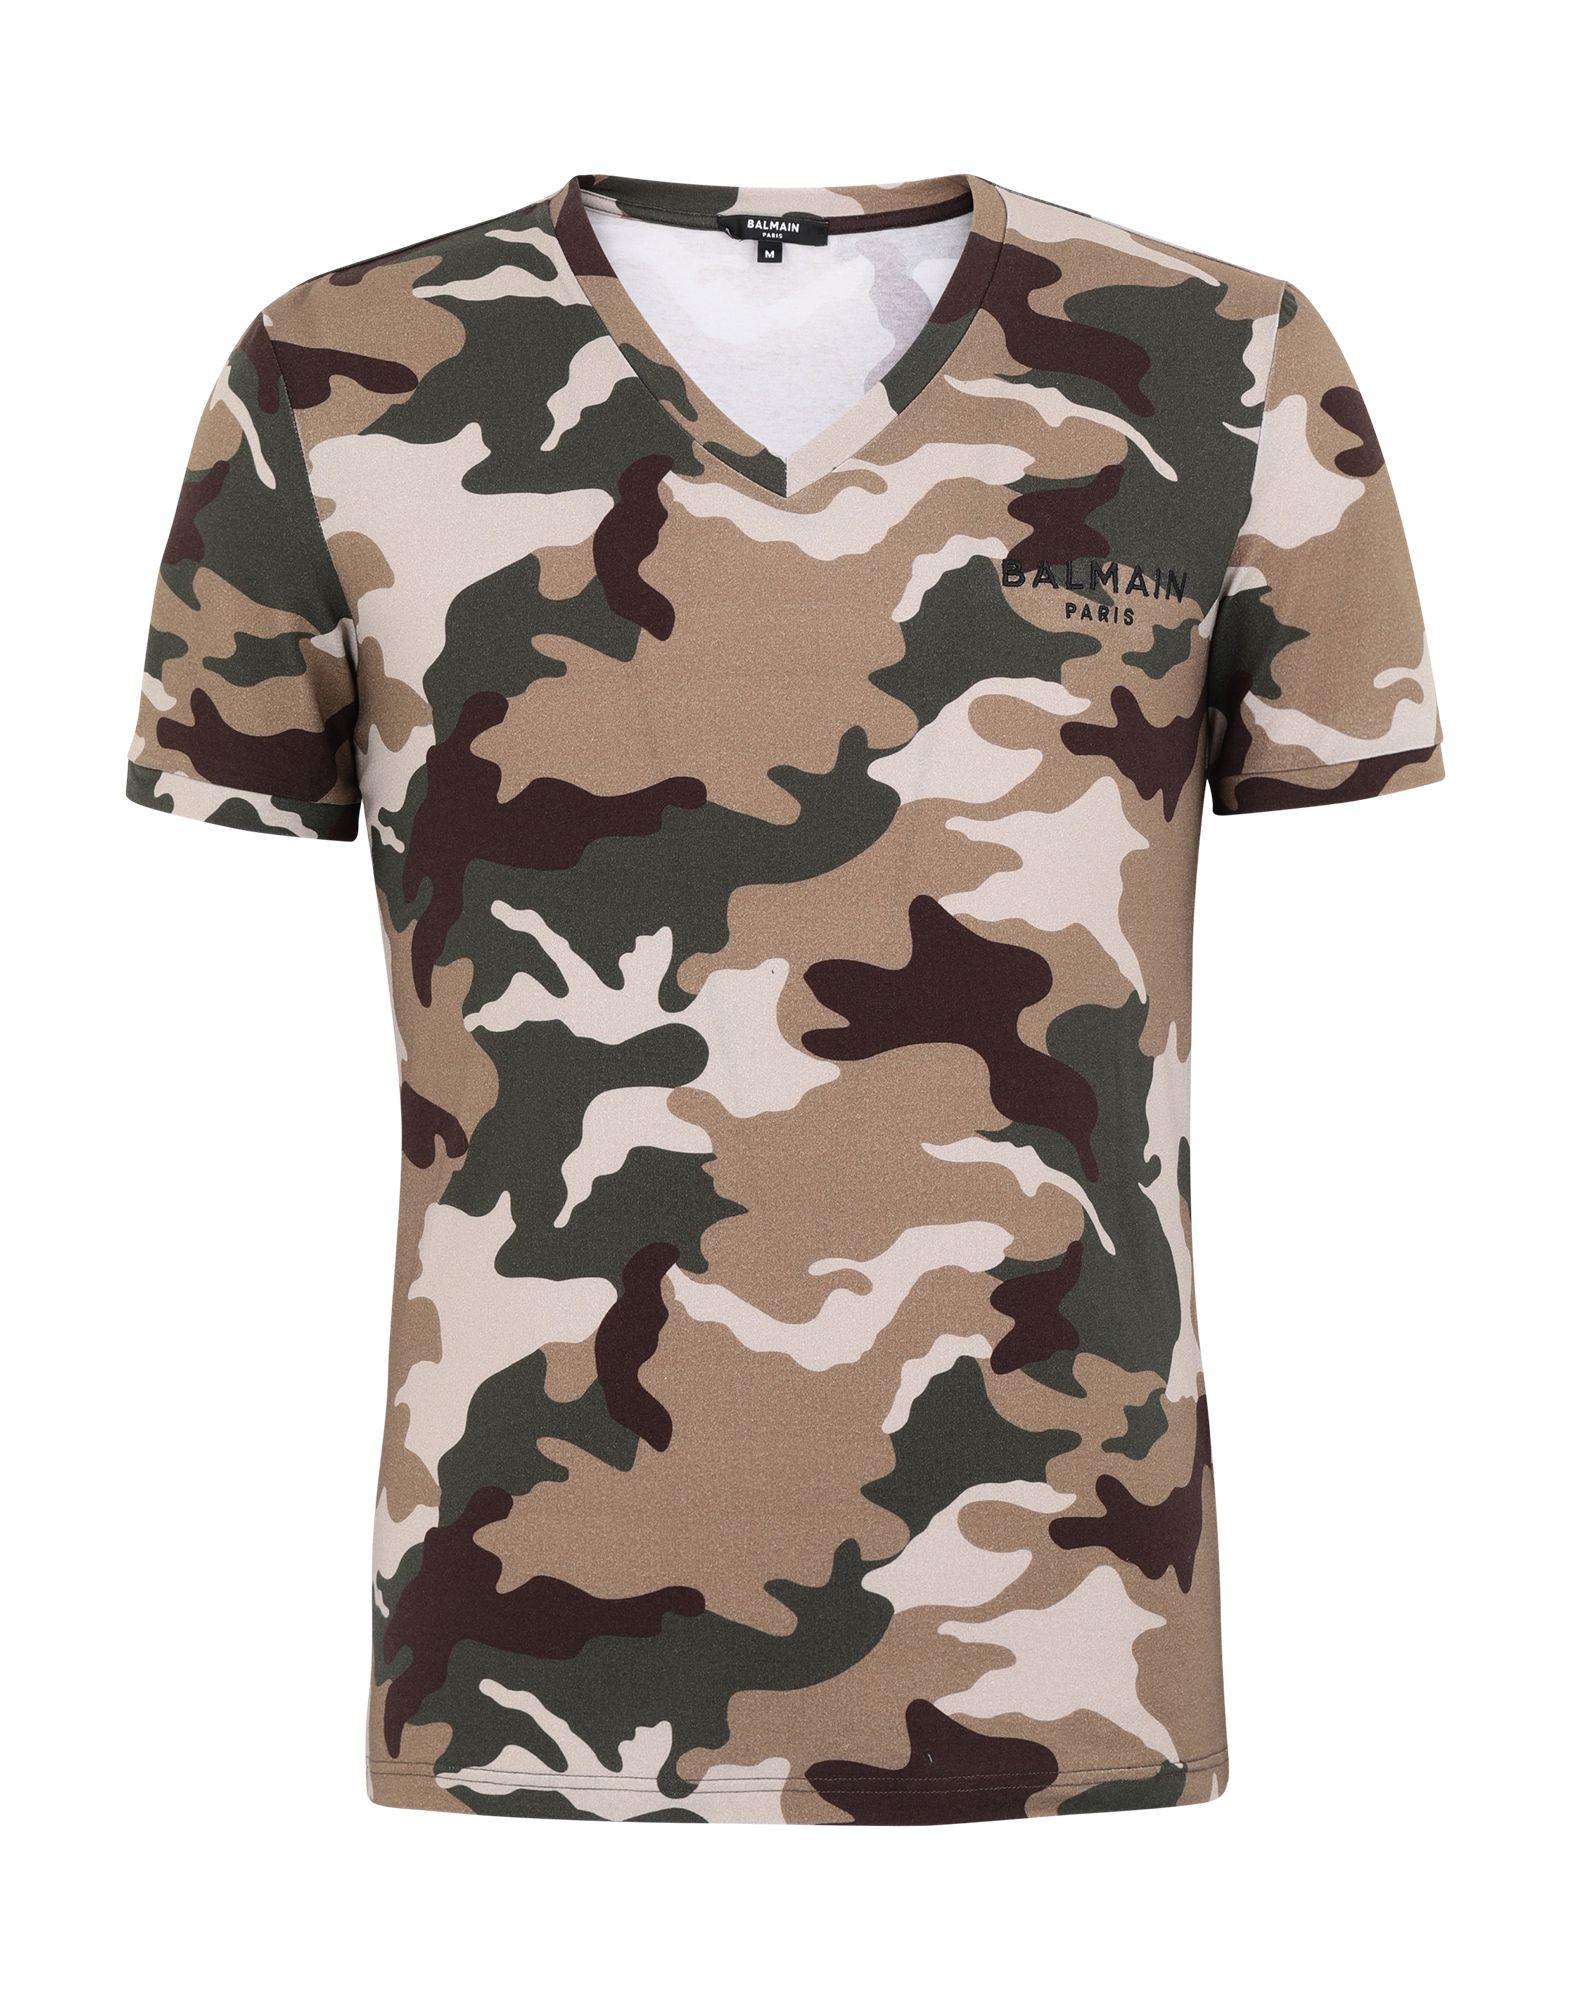 BALMAIN Undershirts. jersey, logo, camouflage, short sleeves, v-neck, stretch. 90% Cotton, 10% Elastane